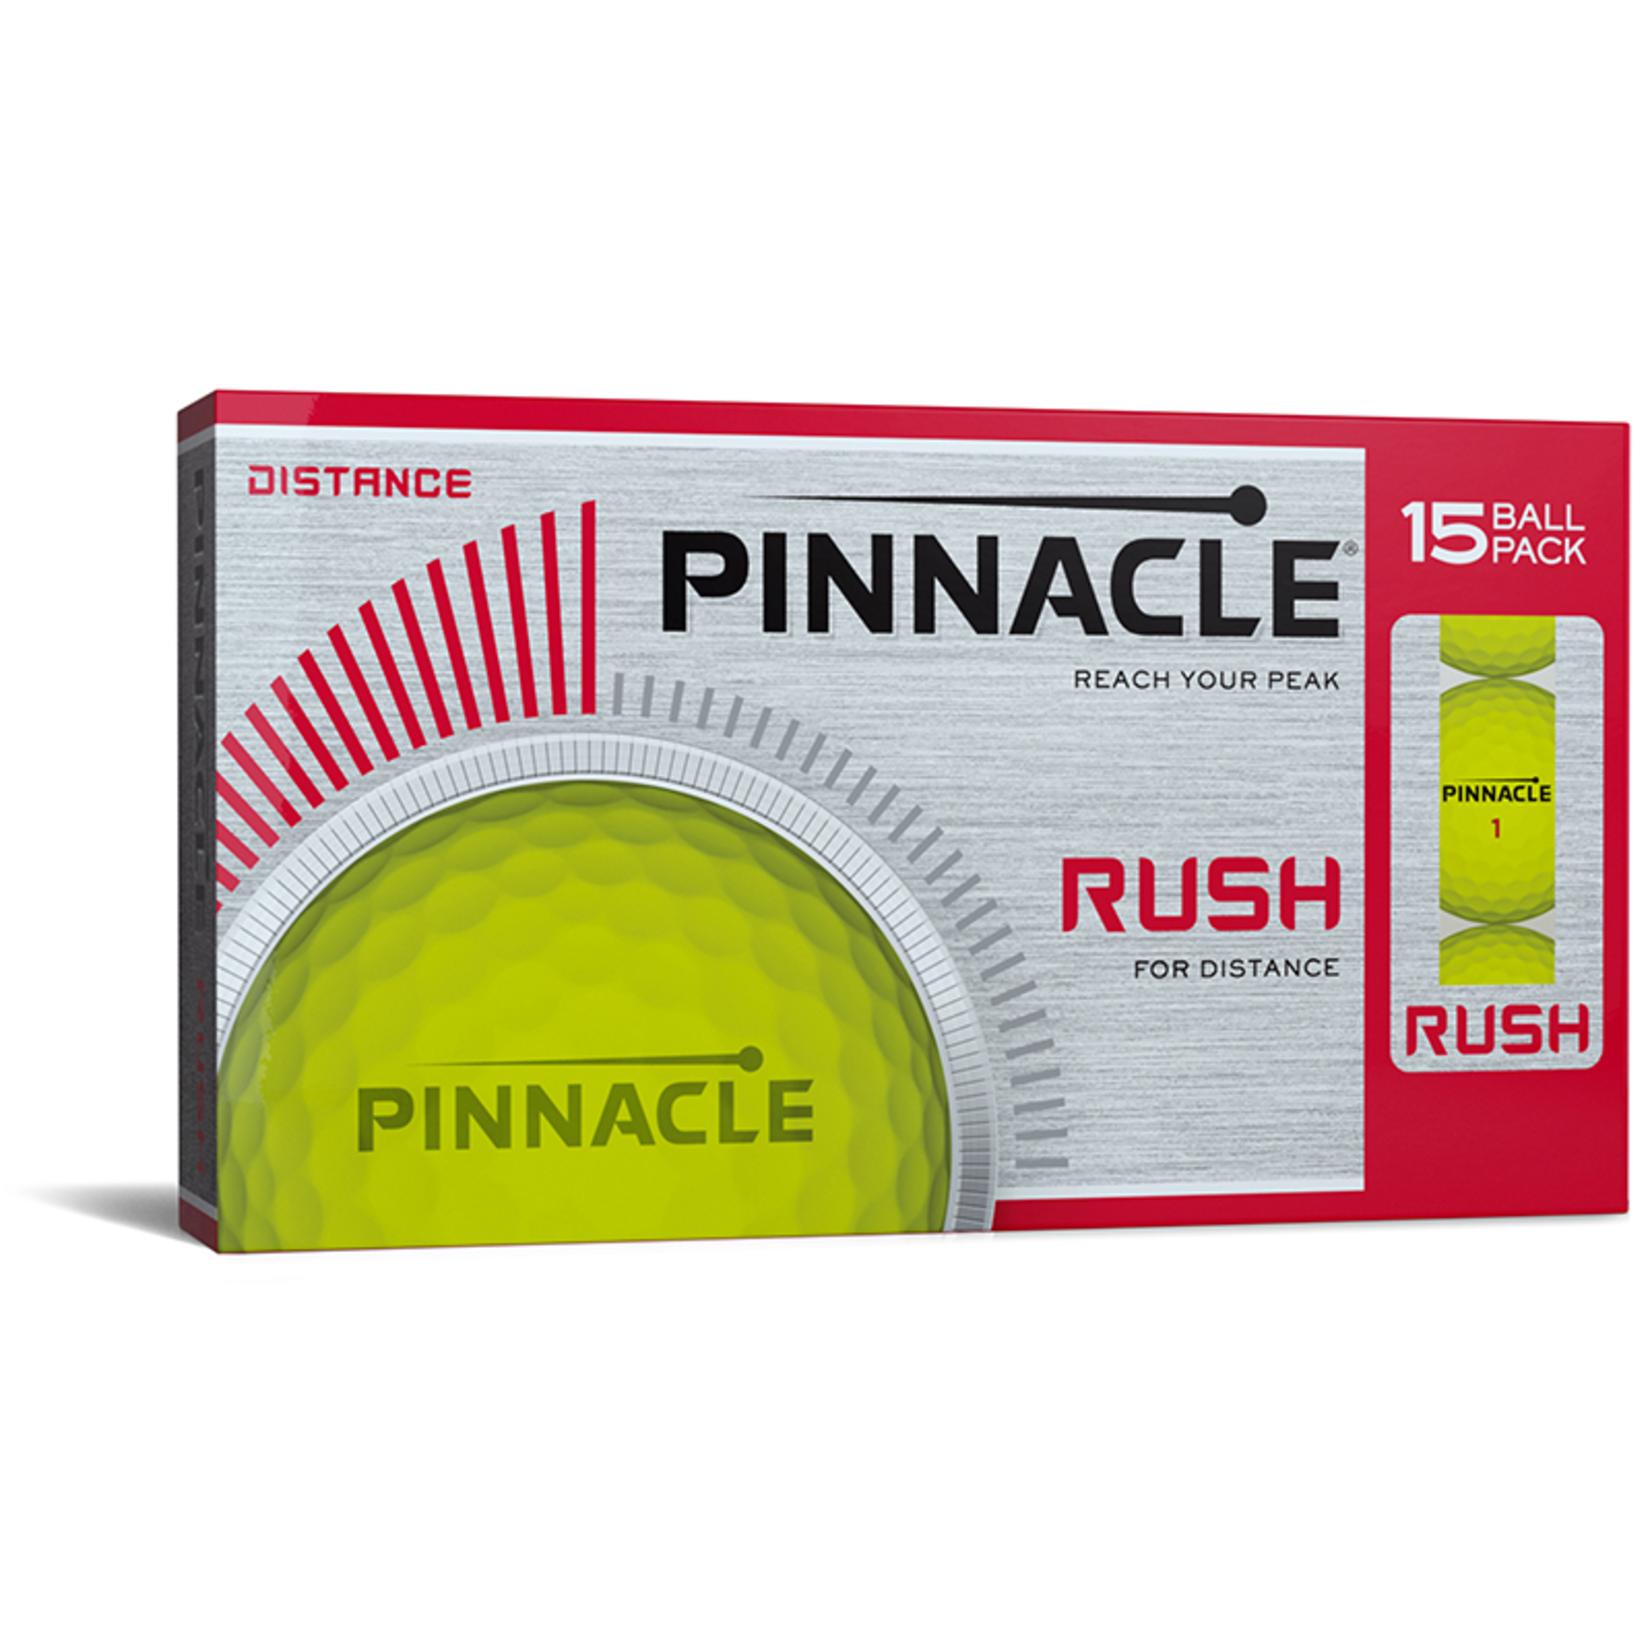 Pinnacle Pinnacle Rush Yellow